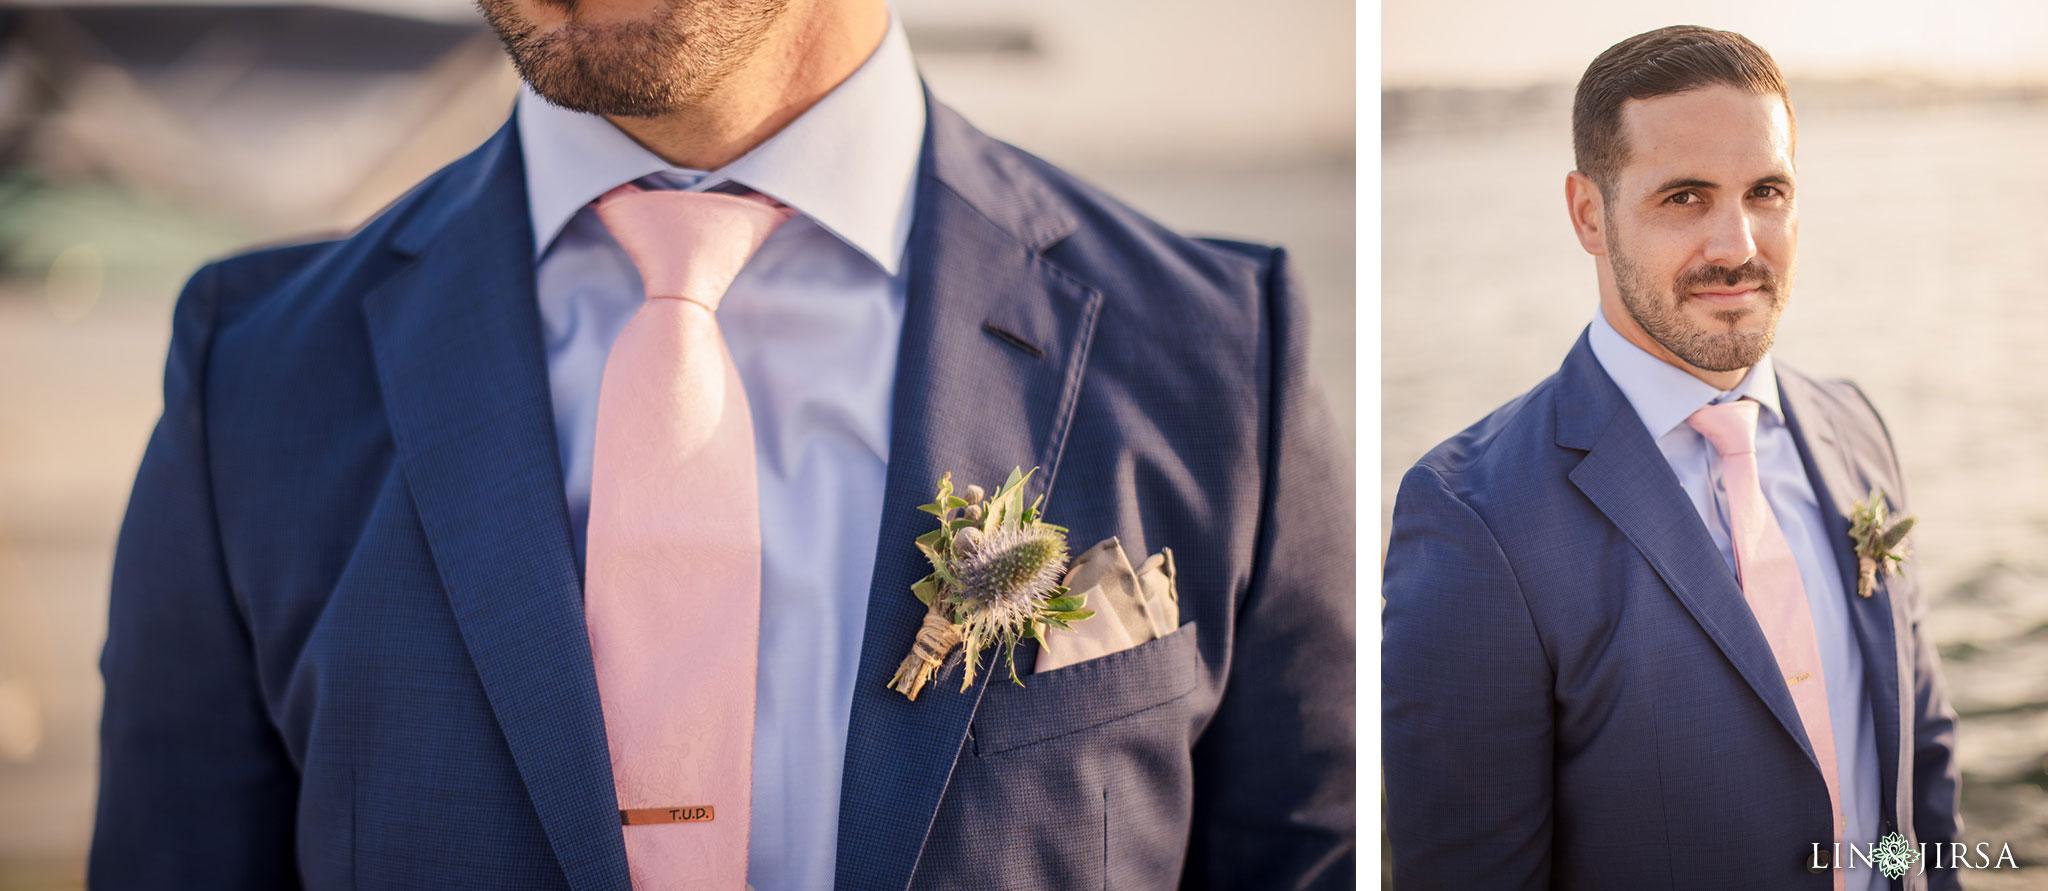 010 marina del rey hotel wedding photography